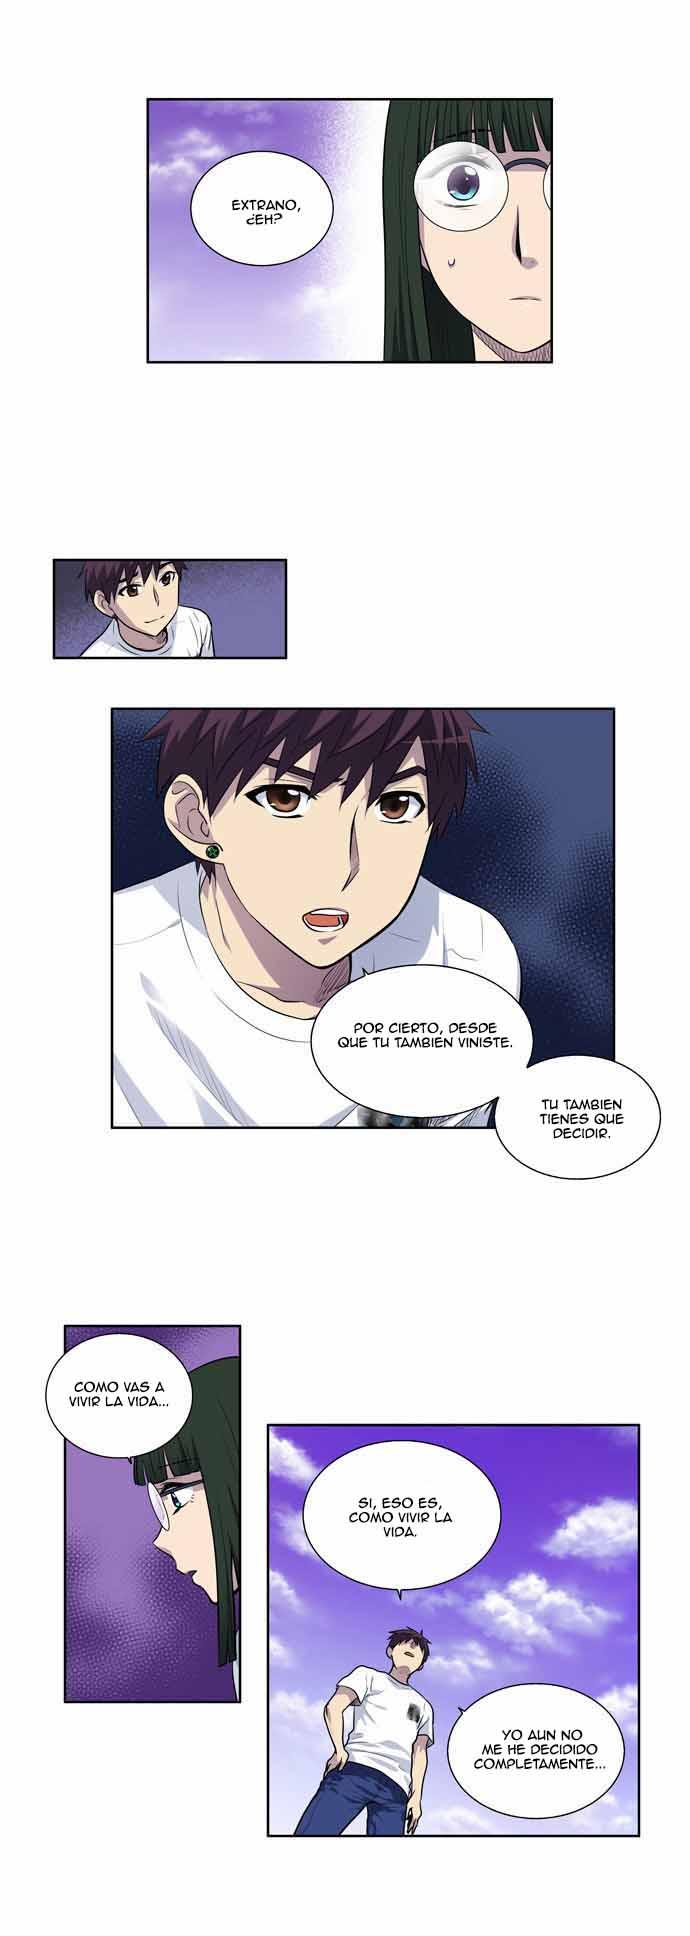 https://c5.ninemanga.com/es_manga/61/1725/430712/2ab0ebde9cc0cd85fc47ce045d440caf.jpg Page 8